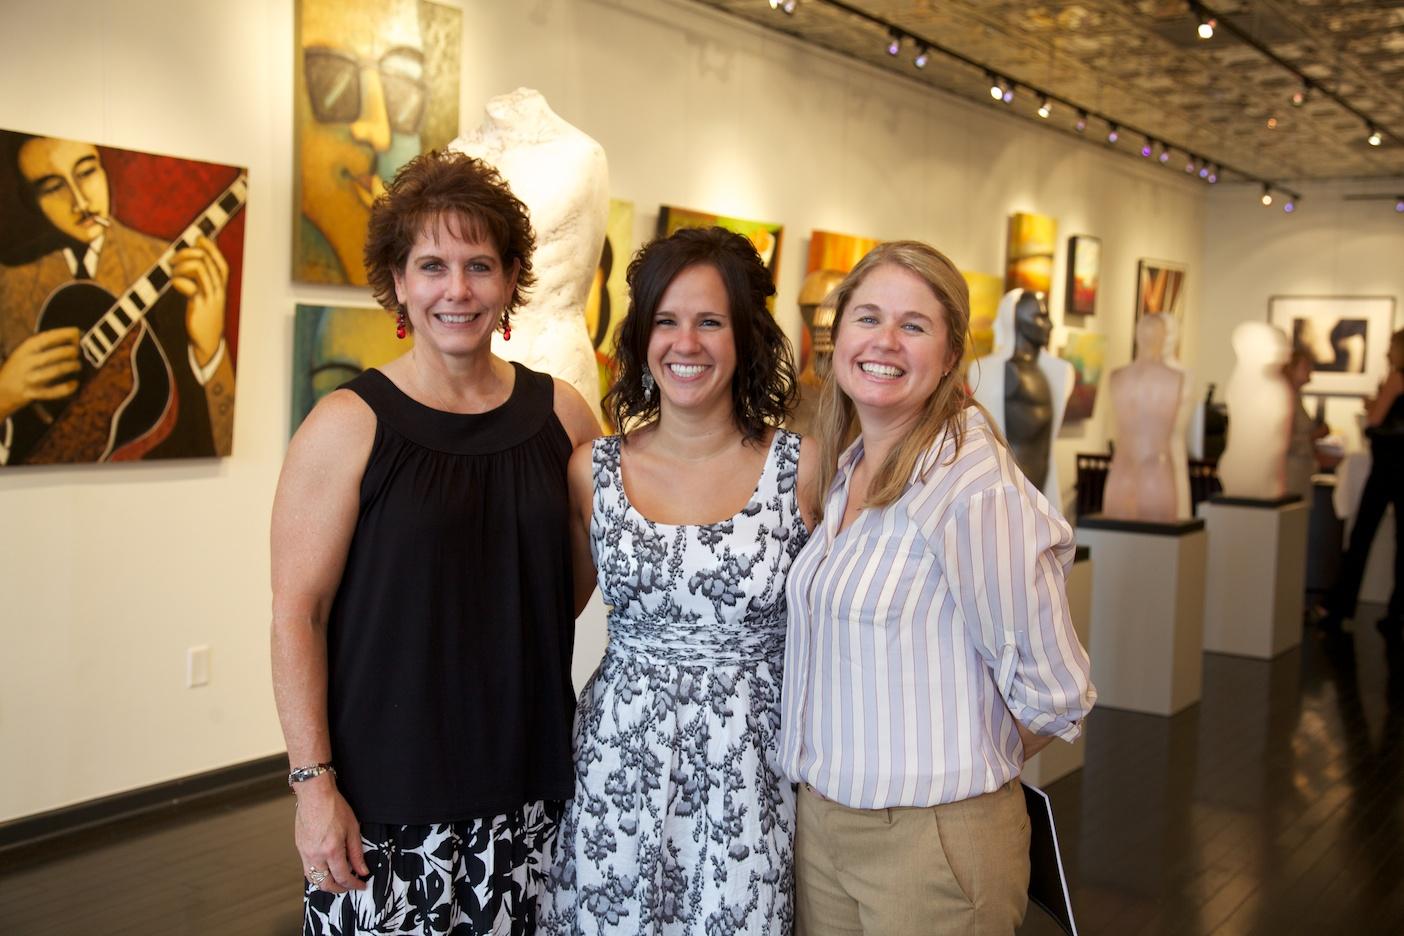 Kim Williams, Brittanie Staqqs, and Sydney Godfrey of PBI Commercial Interiors